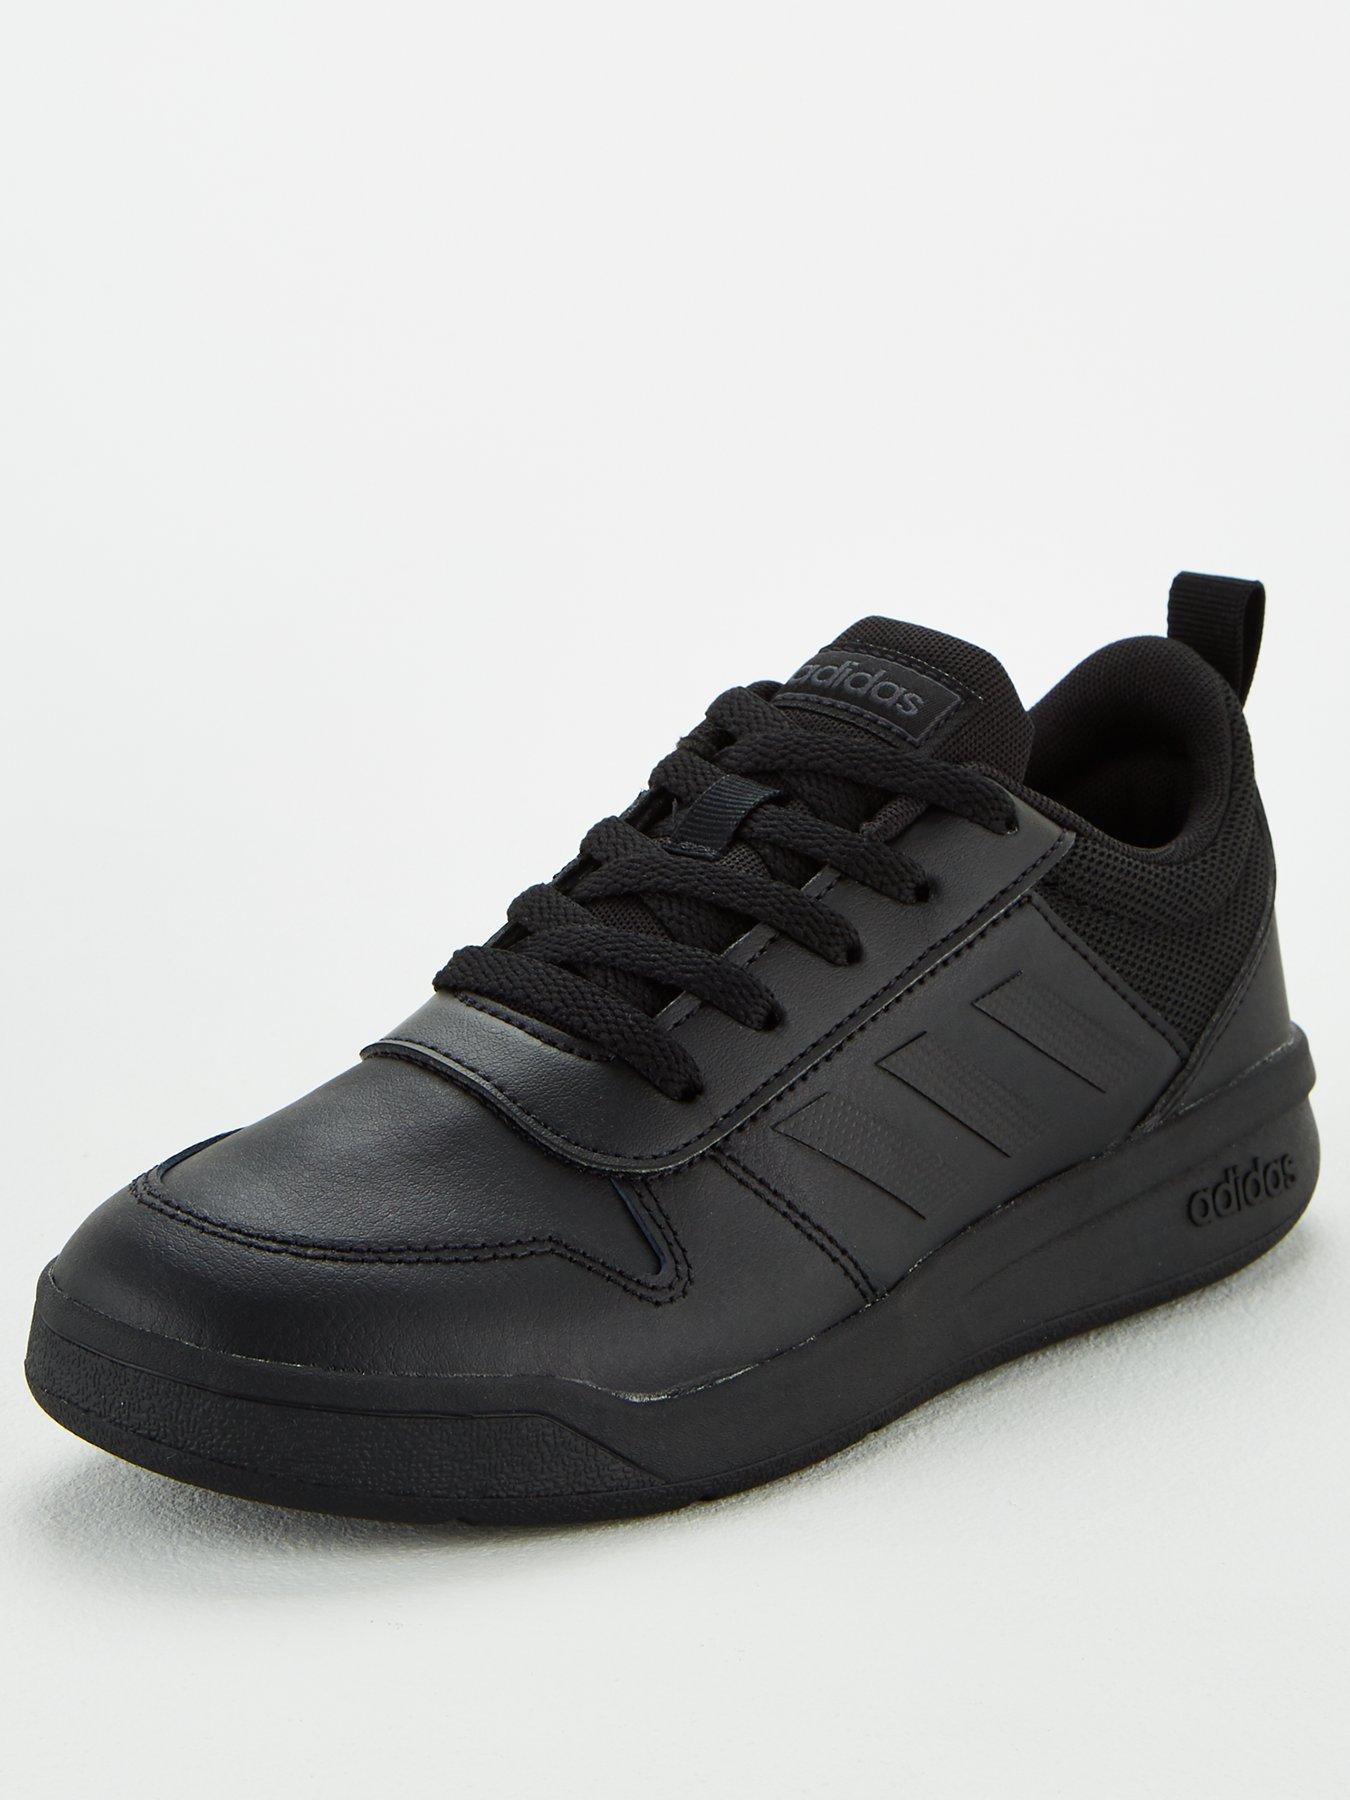 black adidas school trainers